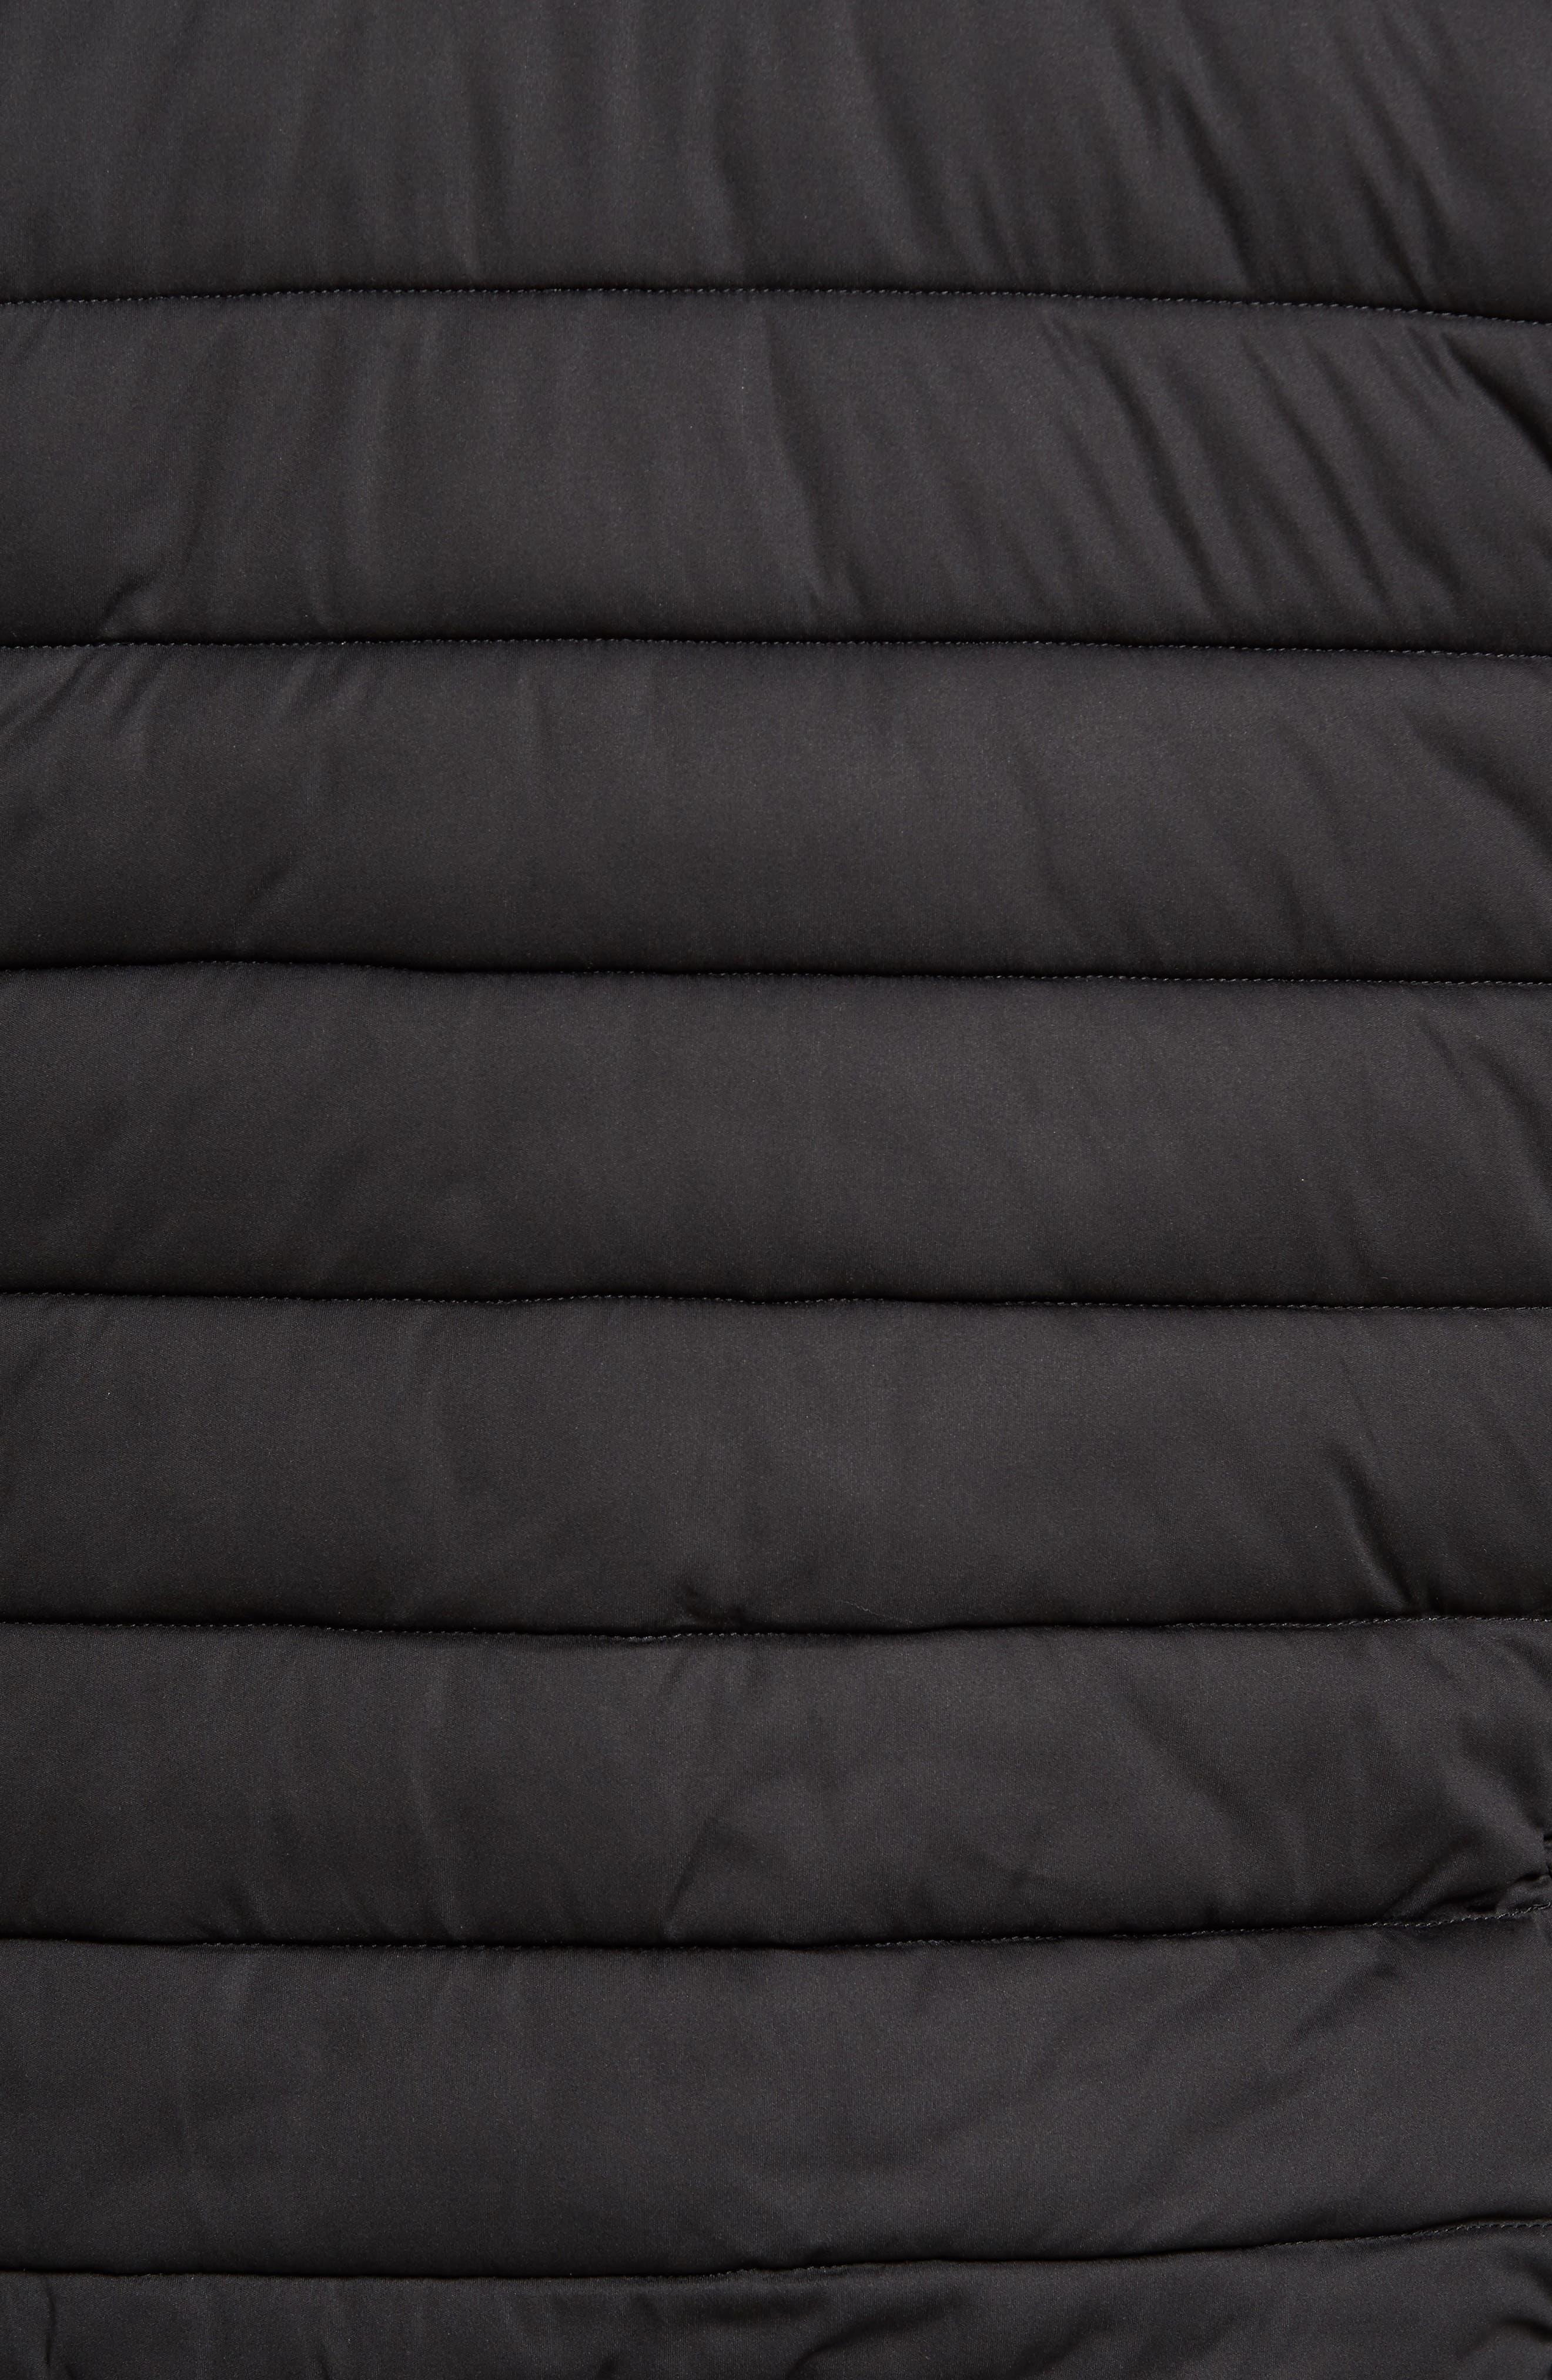 Puffer Jacket,                             Alternate thumbnail 5, color,                             001